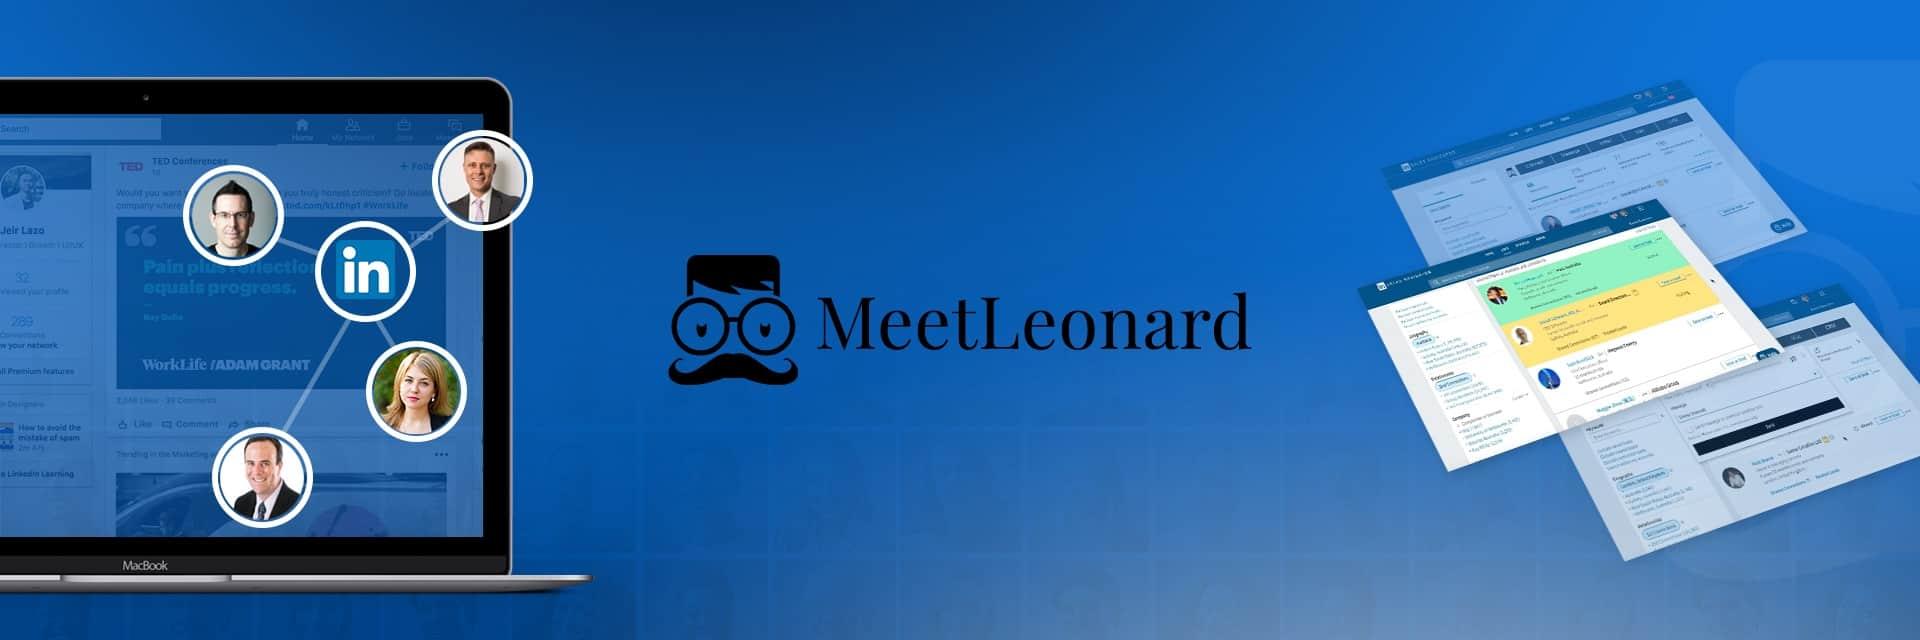 MeetLeonard-banner